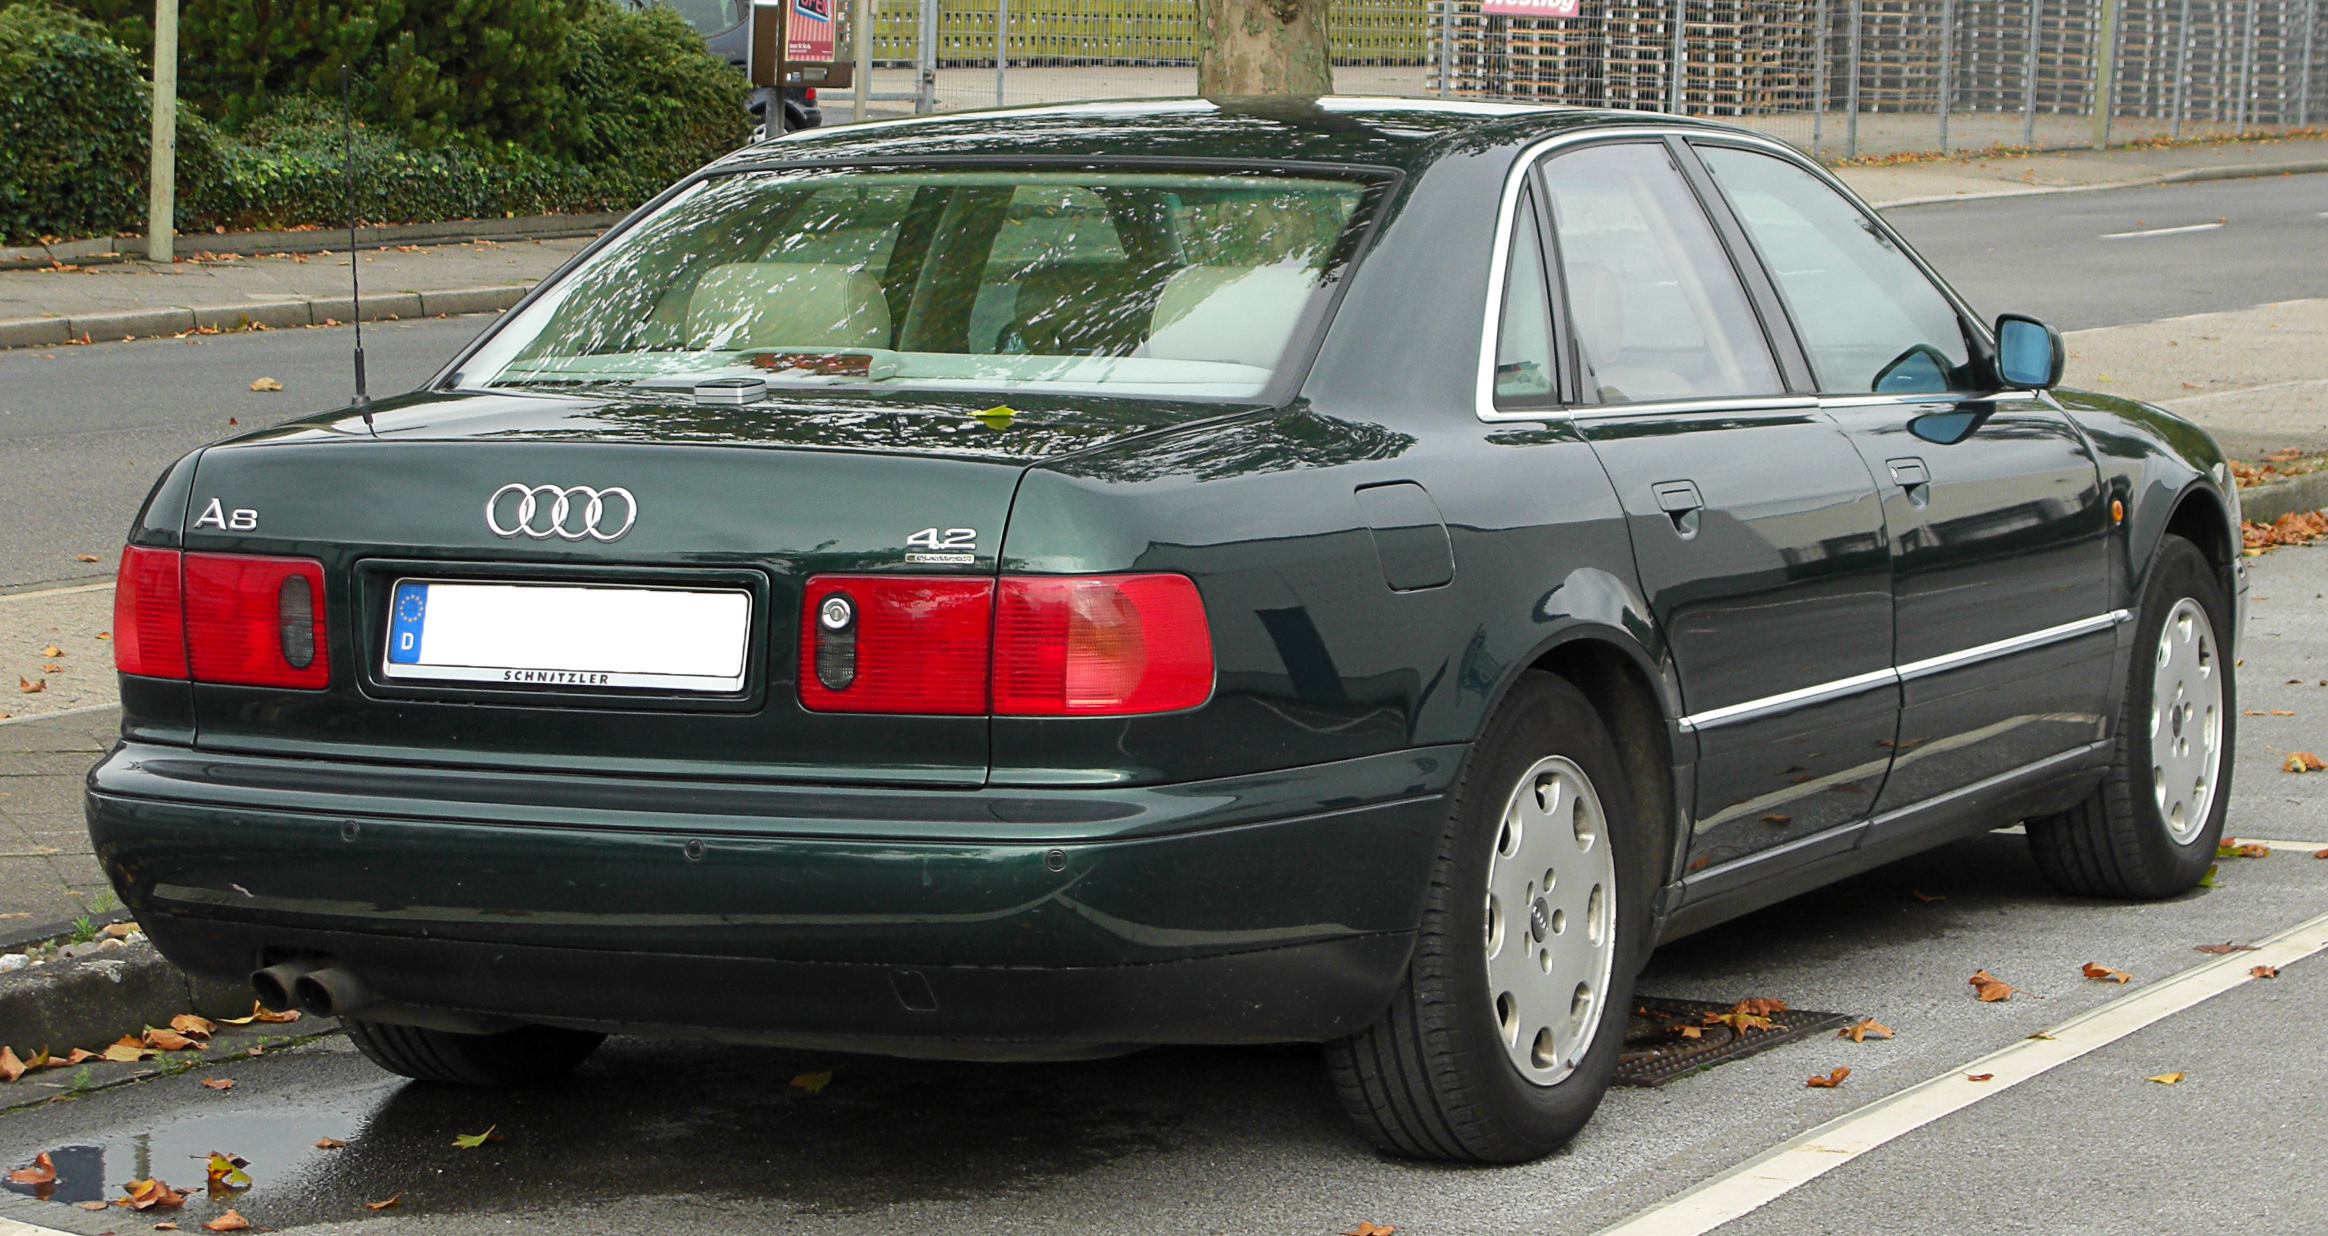 1996 audi quattro commercial nylon feet big car dismount - 5 3